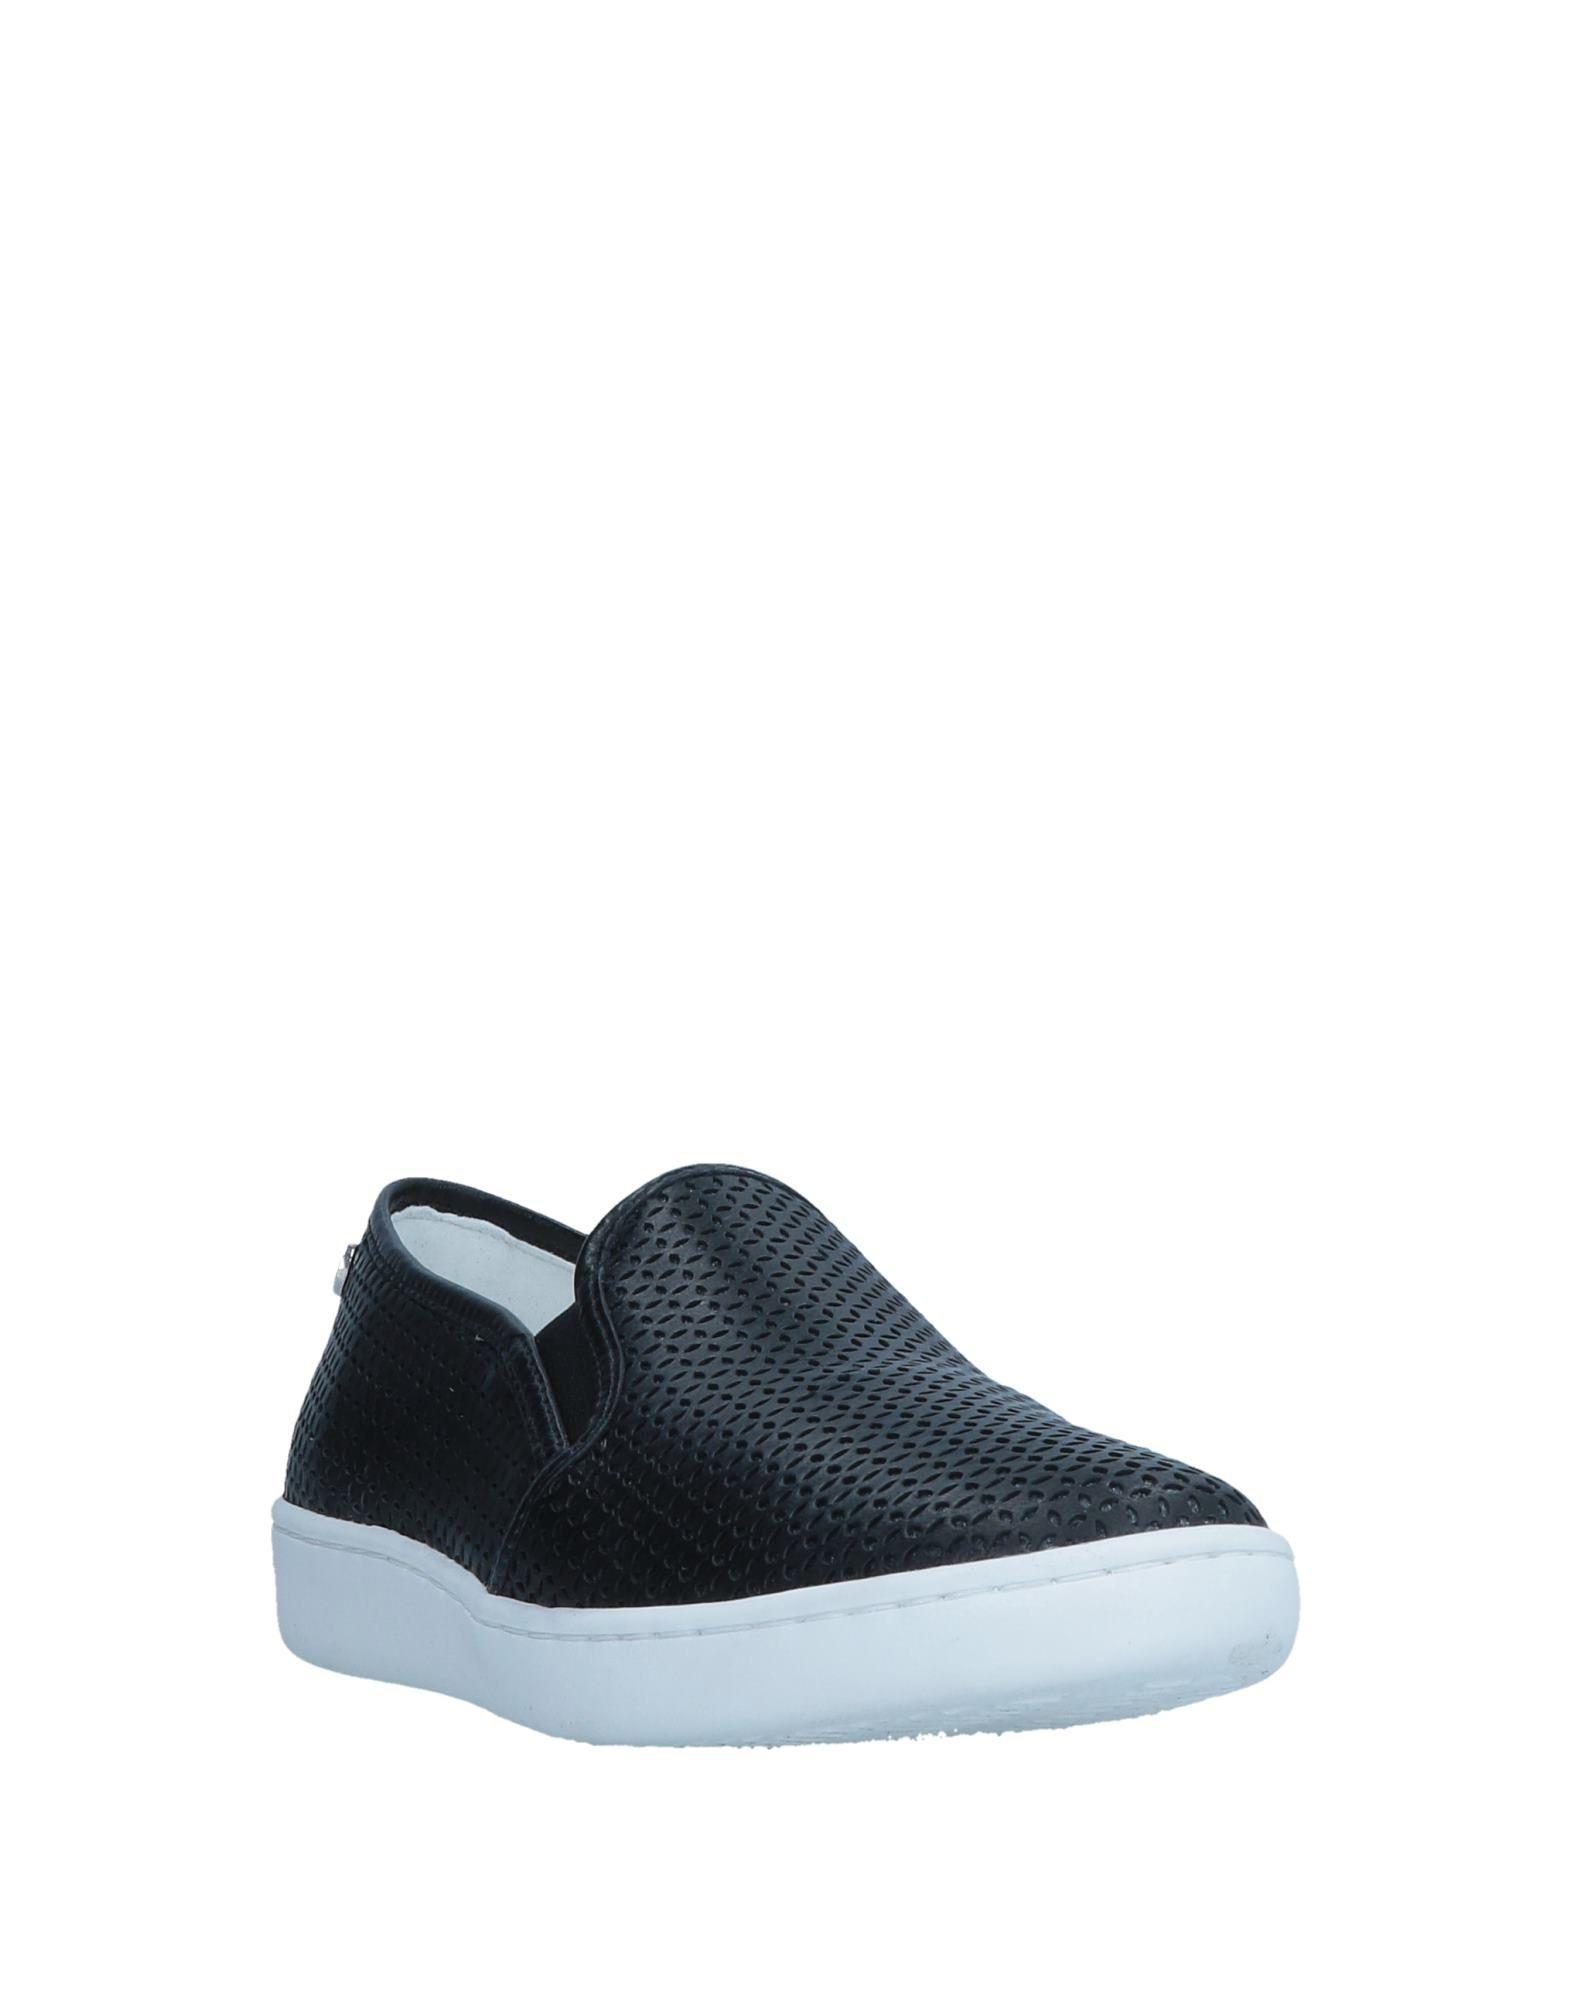 Keys Sneakers - Women Keys Sneakers online on  United United United Kingdom - 11555012IN 9a341b